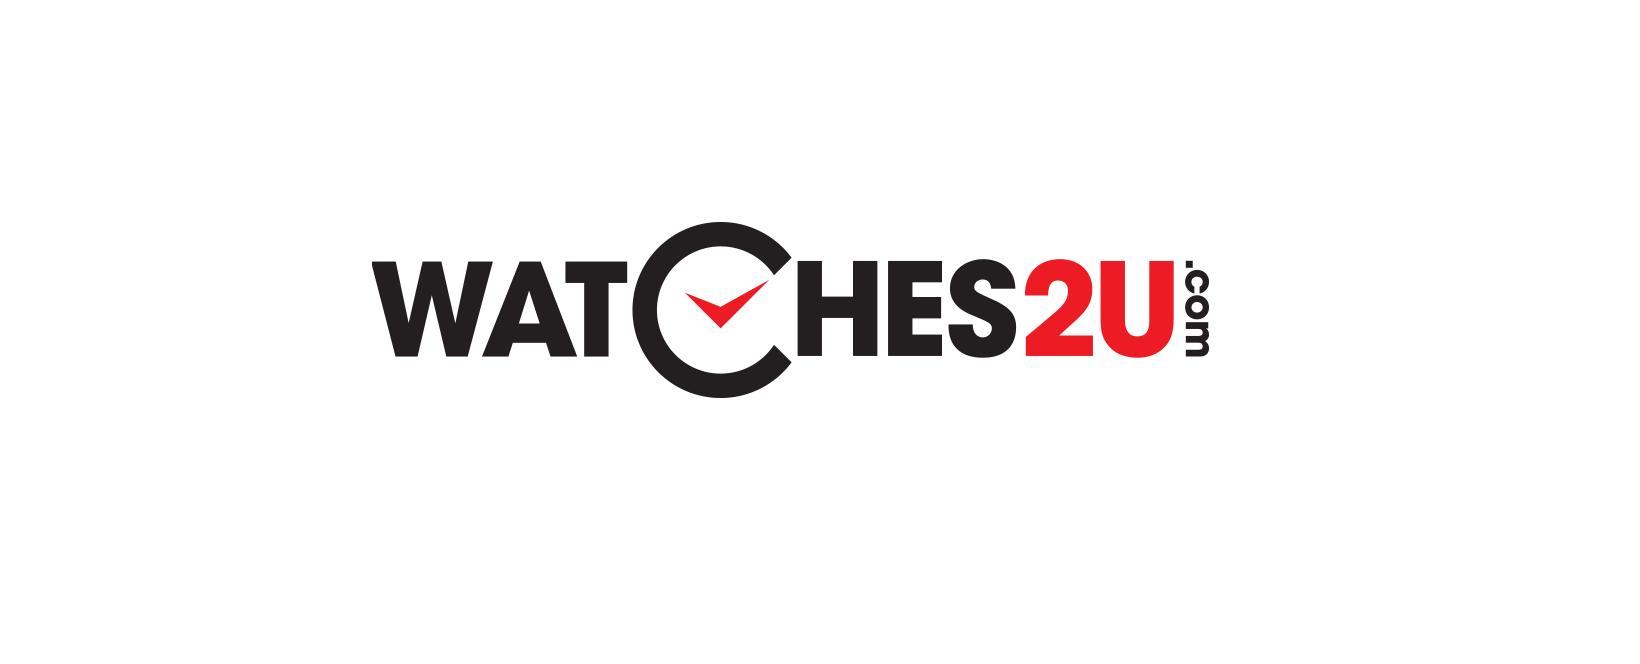 Watches2U Discount Code 2021